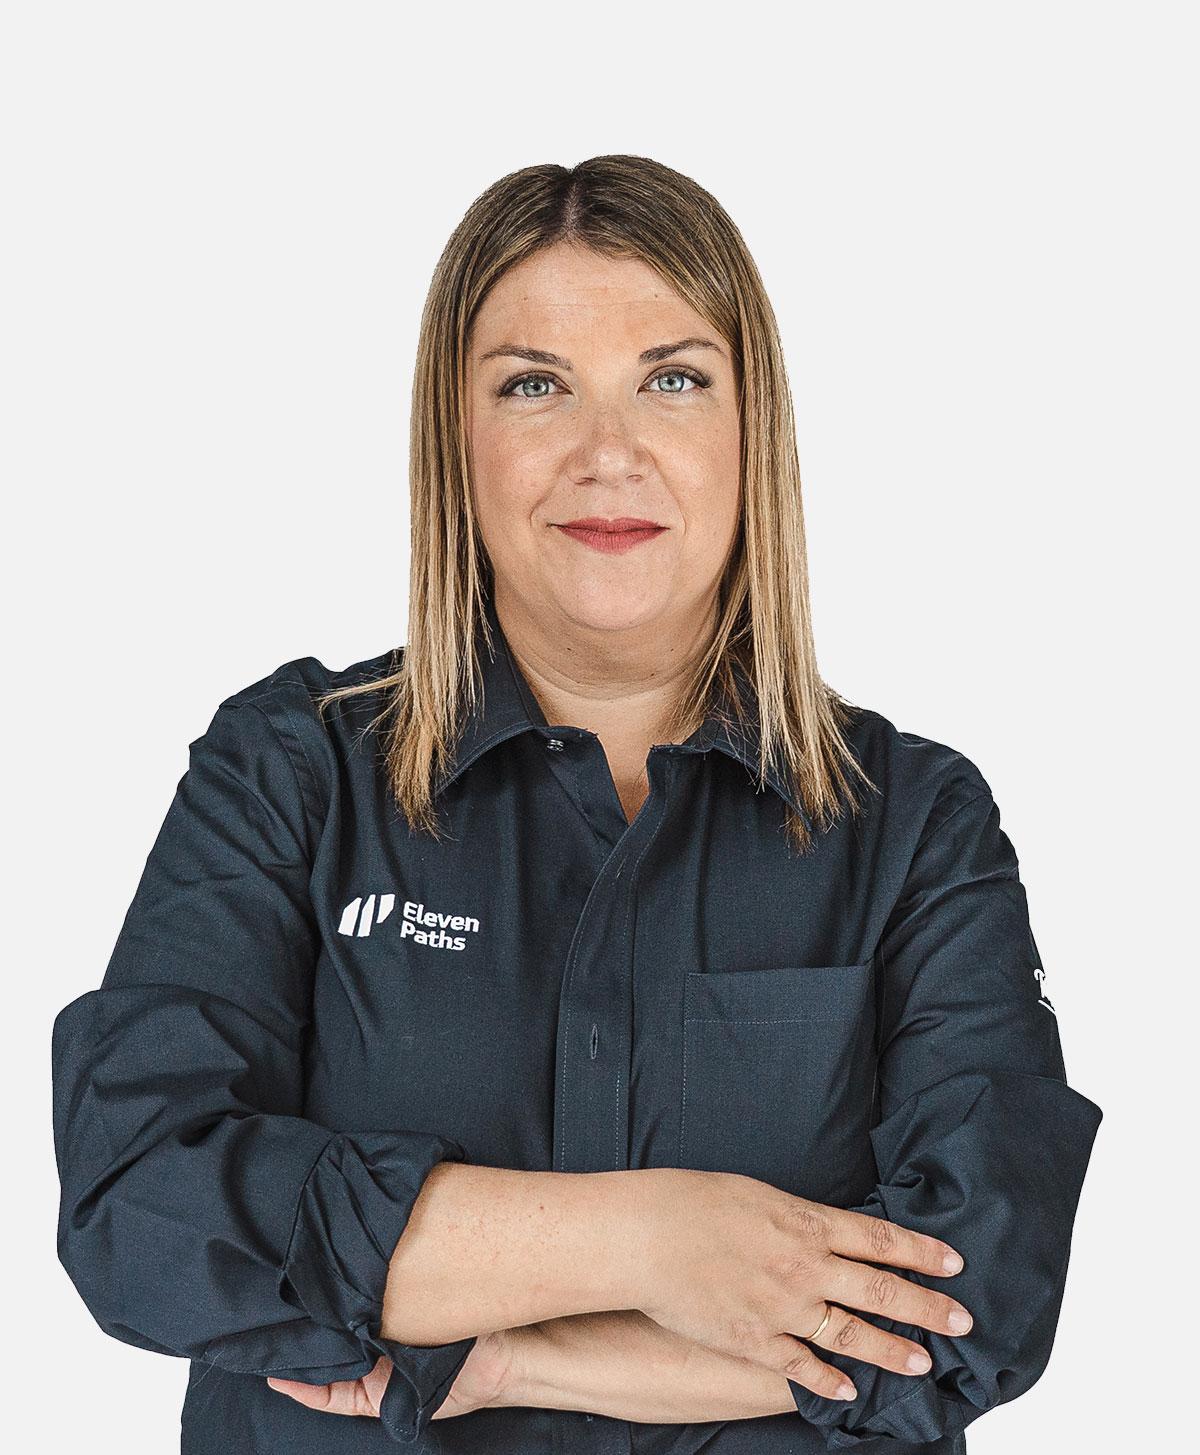 María Díaz Hernández